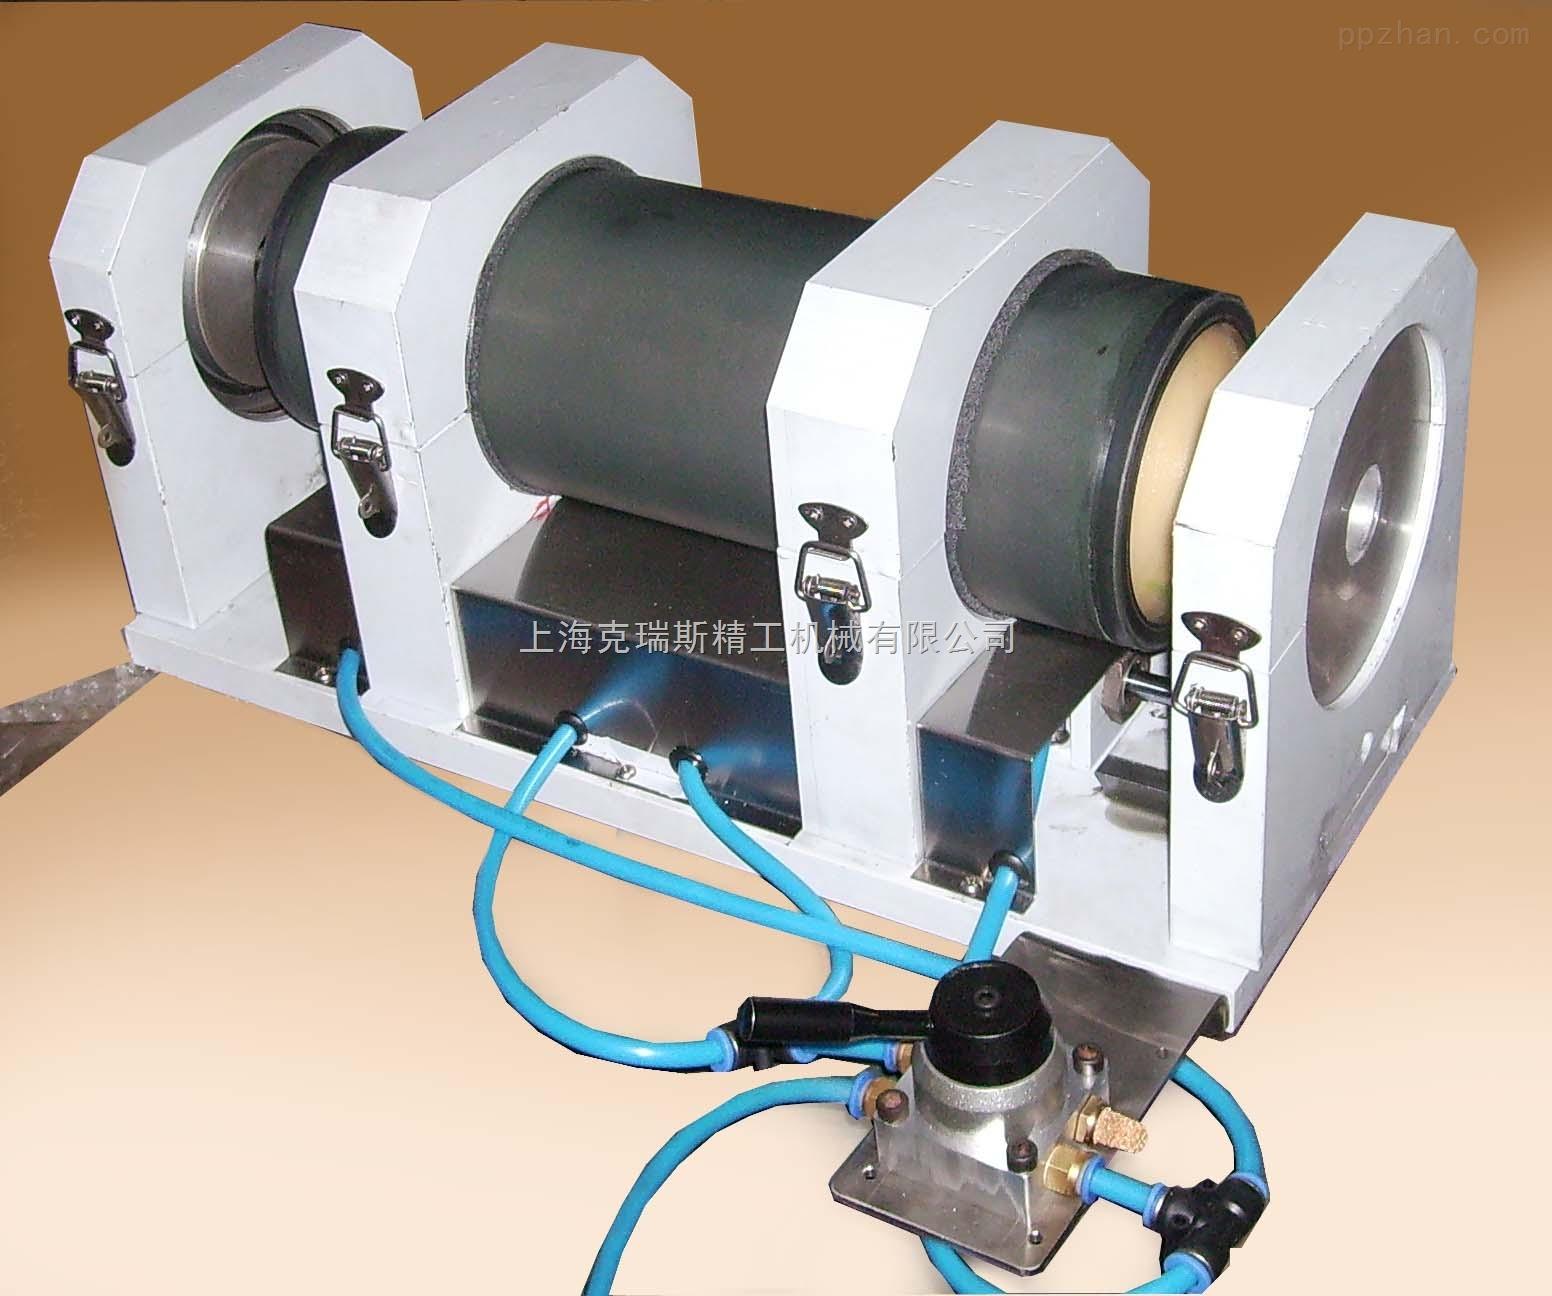 PSI/1R500T-套筒式网纹辊通轴装卸器价格